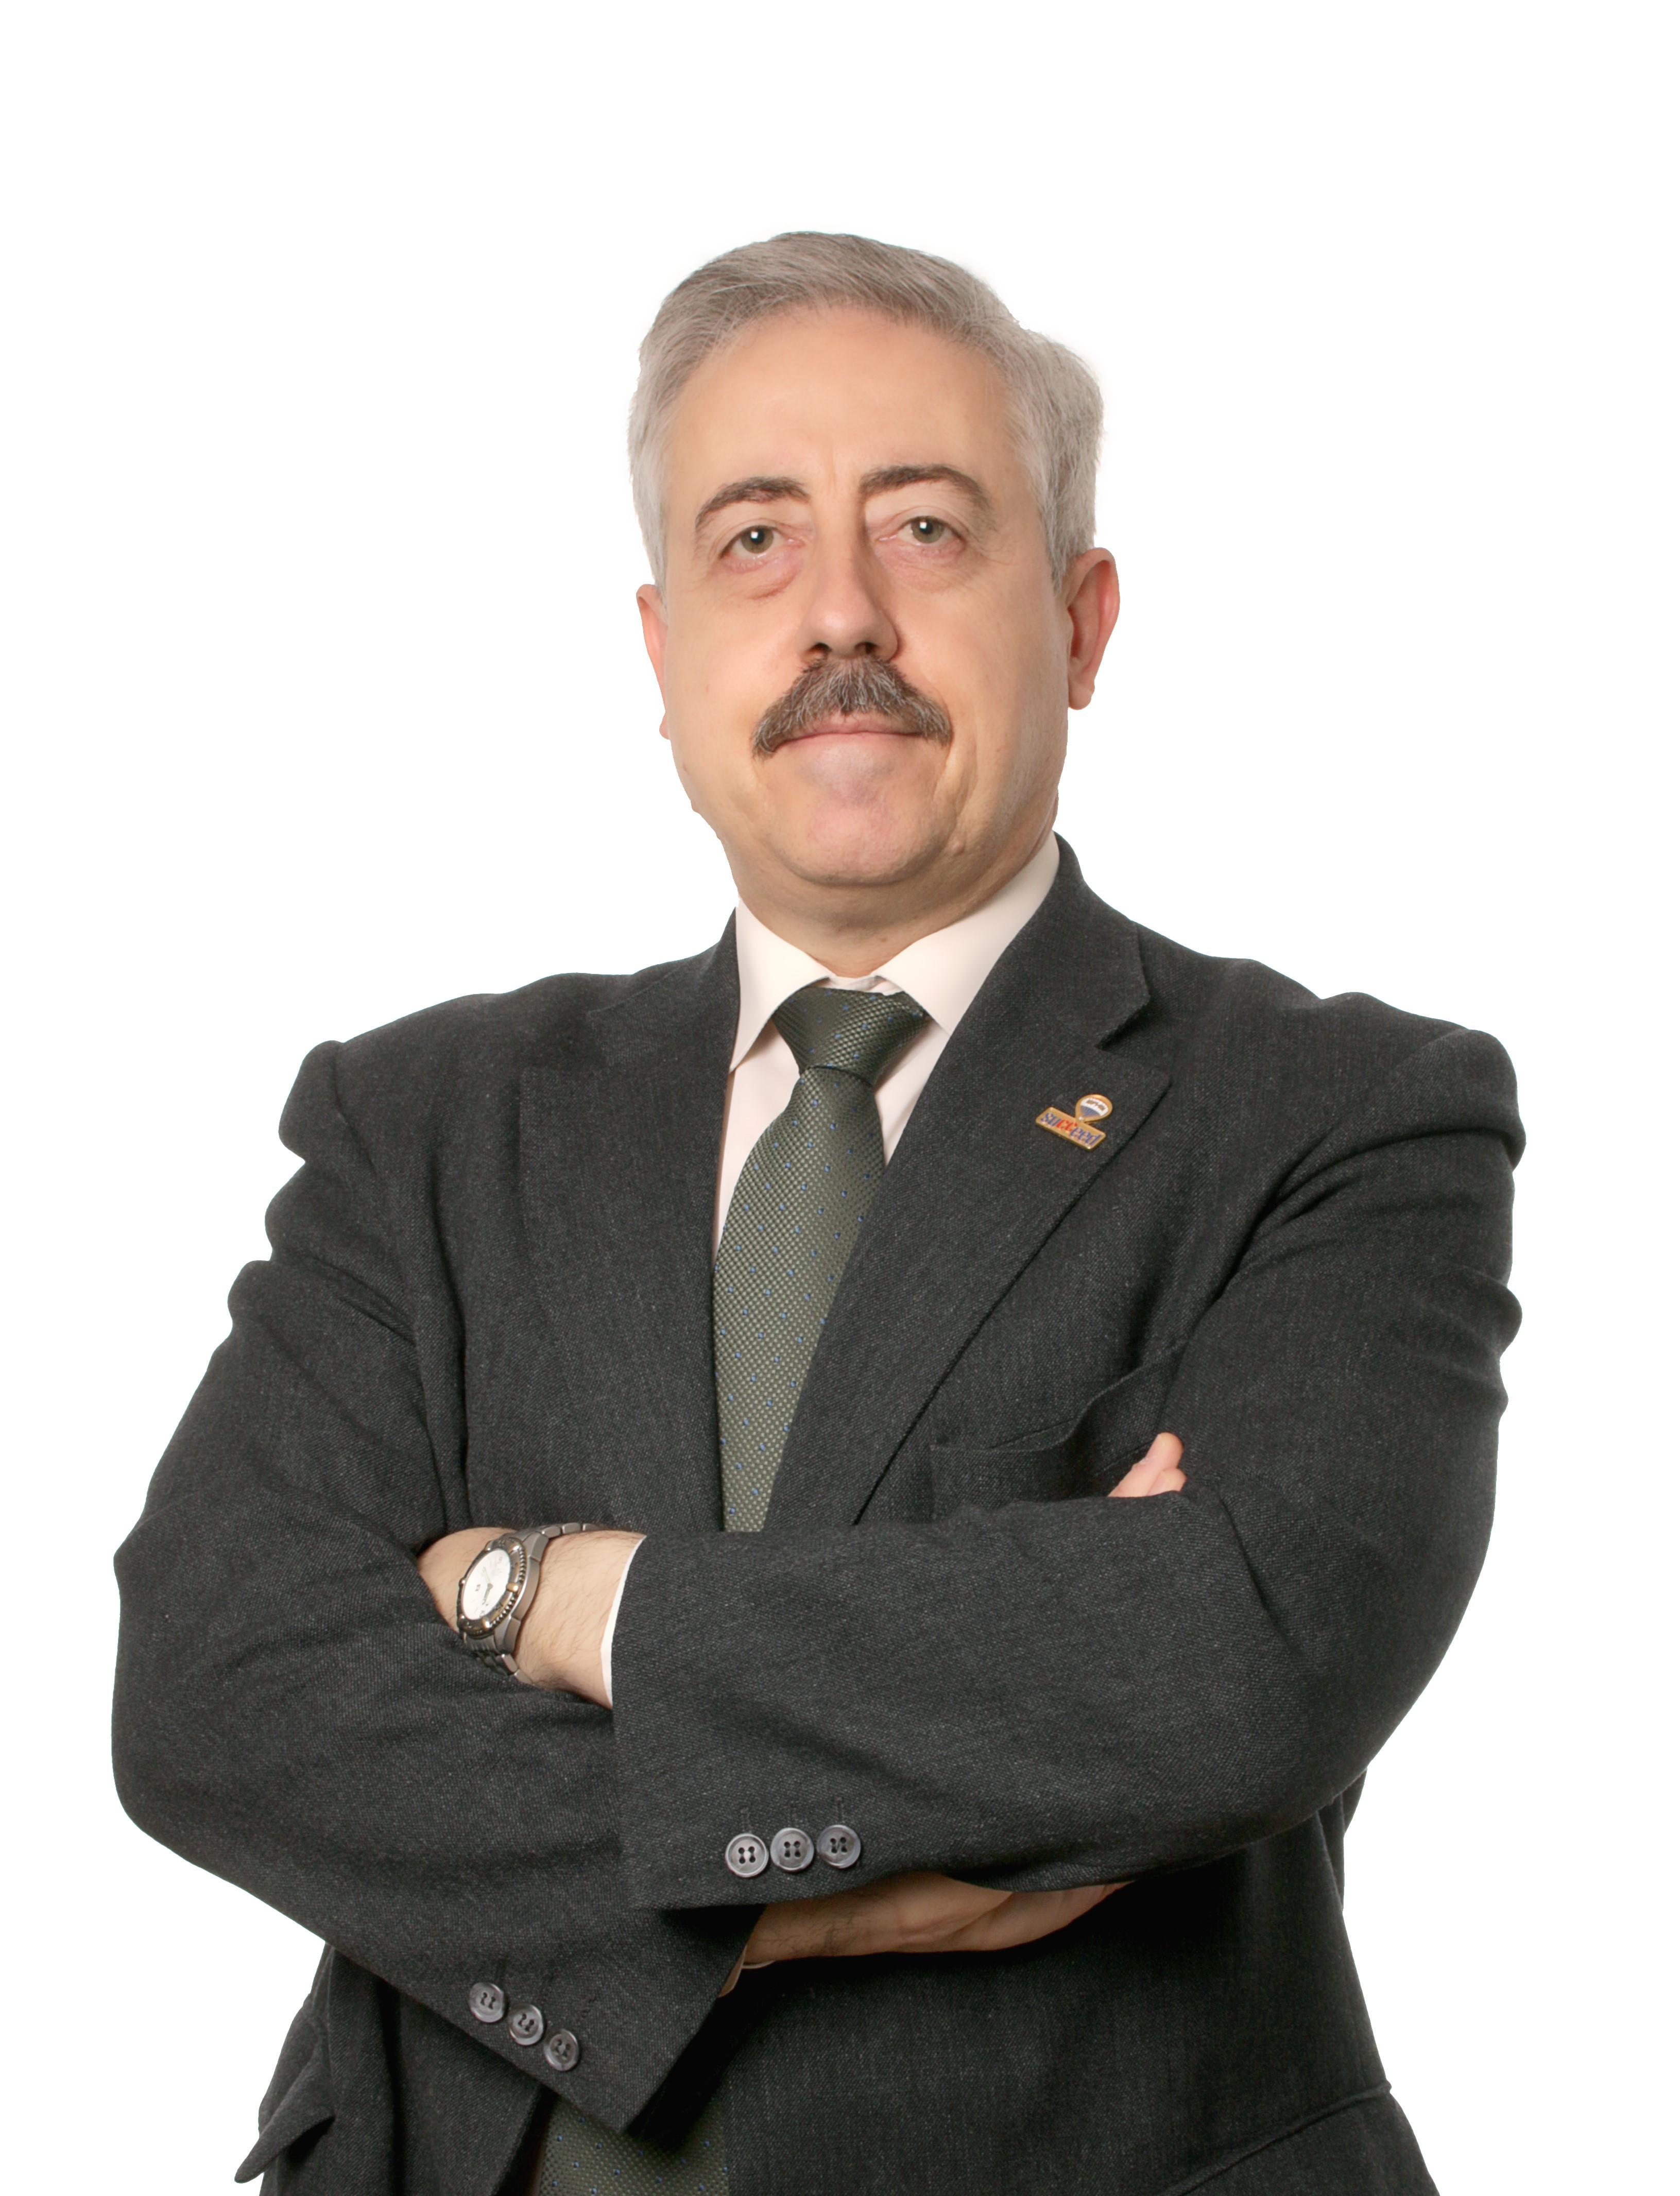 Diego Cerrato